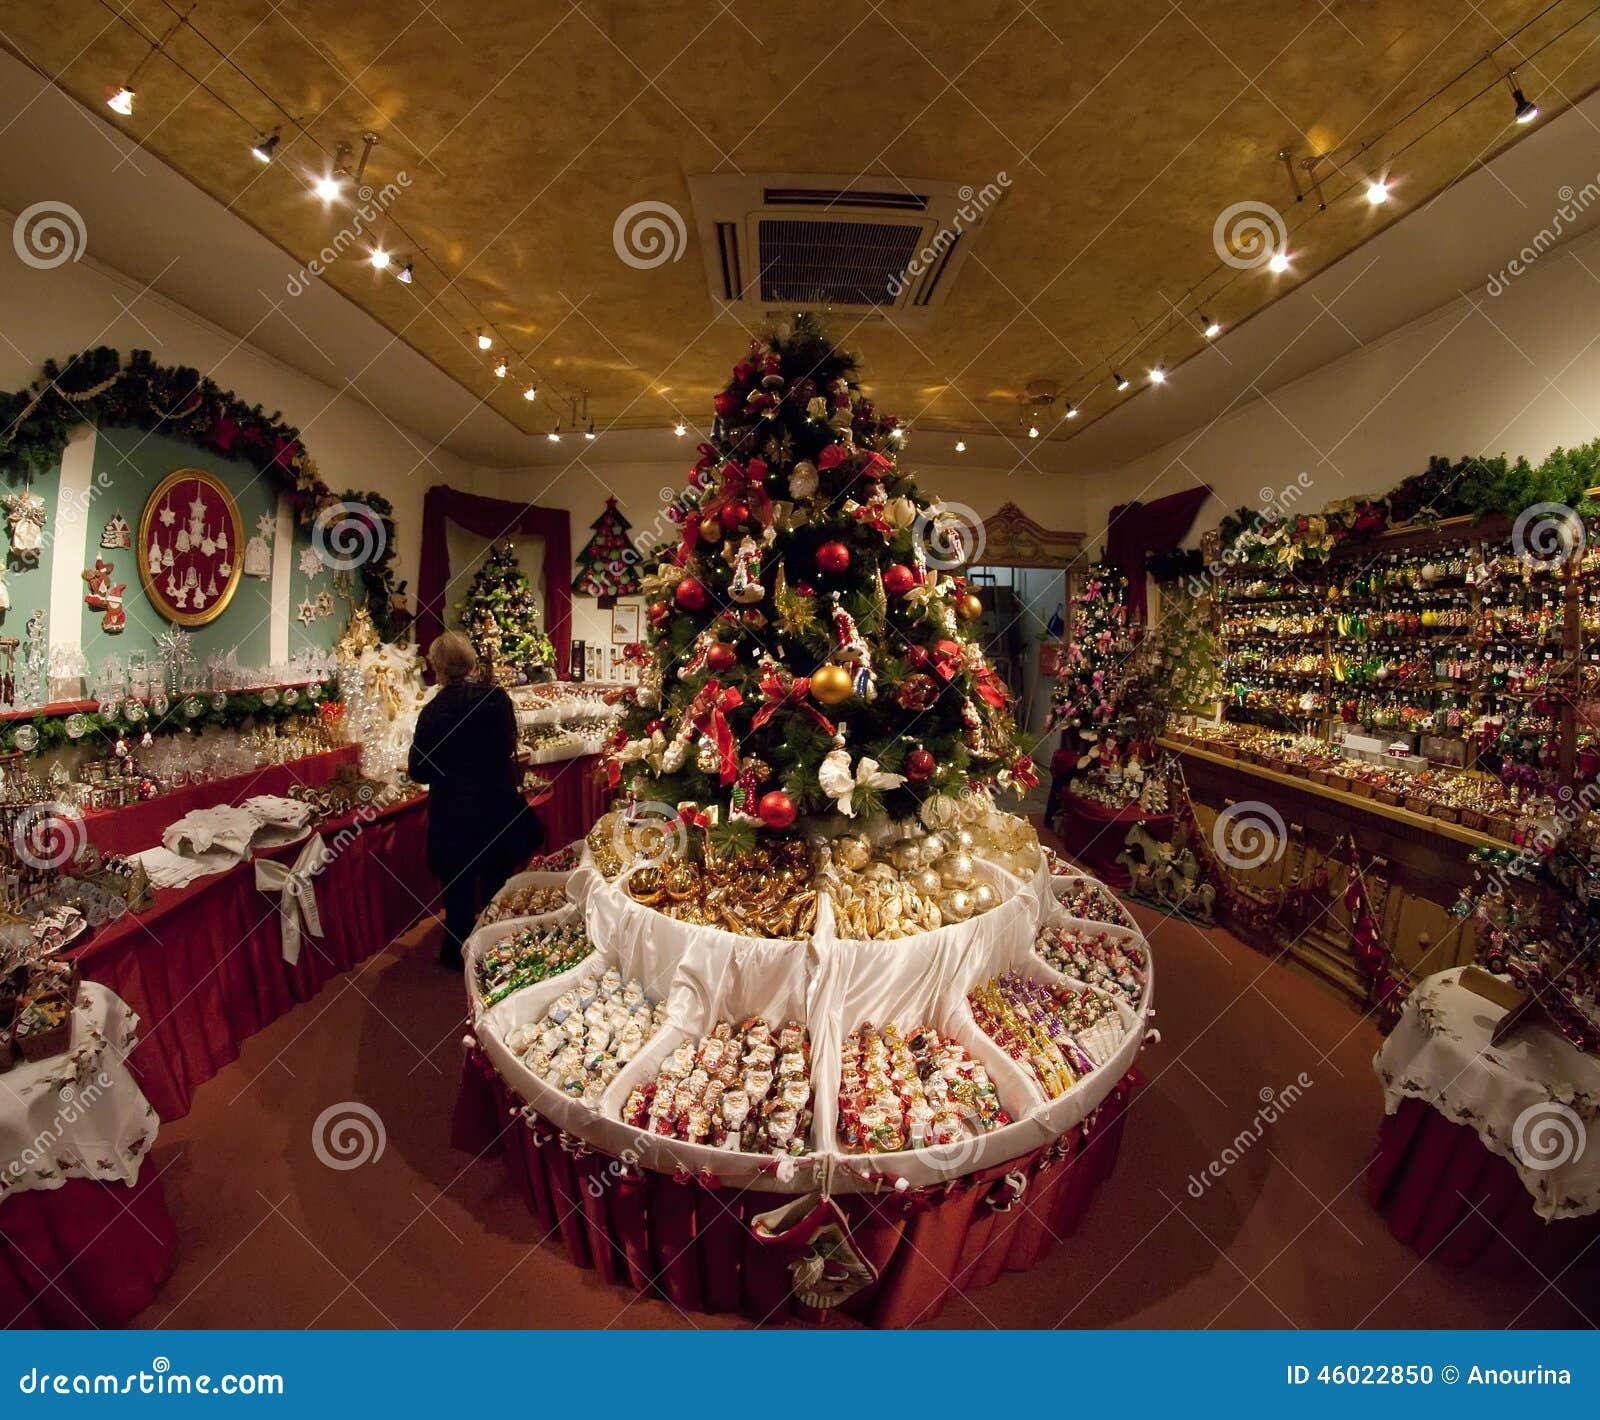 #A33028 Boutique Avec Des Décorations De Noël Image éditorial  5353 decorations de noel bruxelles 1300x1170 px @ aertt.com